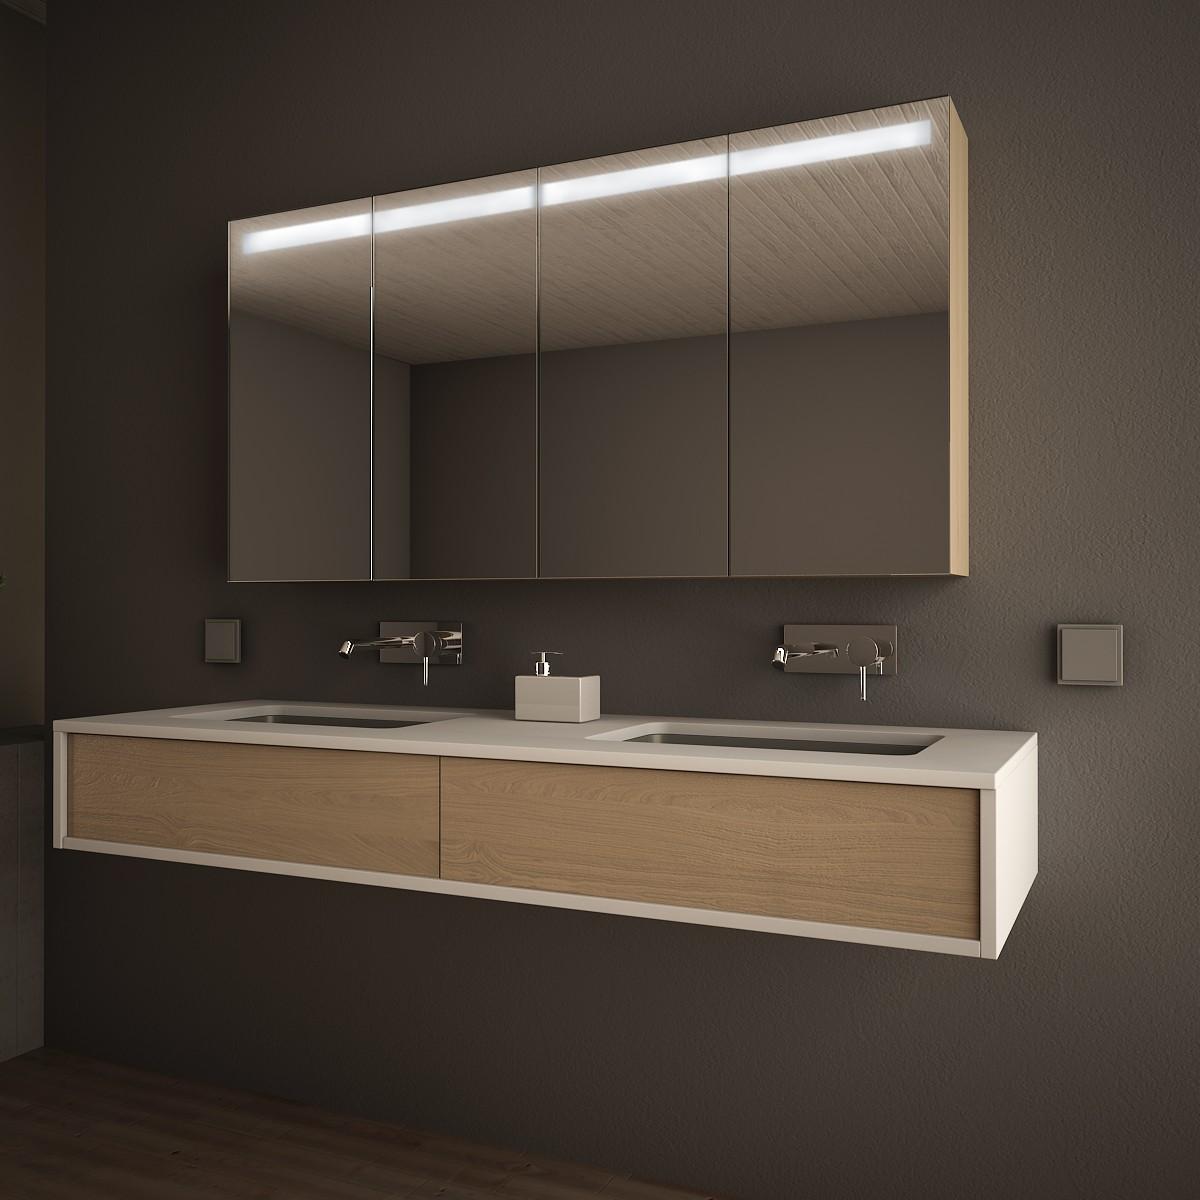 Badezimmer Spiegelschrank Linja Beleuchtet Badspiegel Kaufen Badspiegel Shop Badspiegel Nach Mass